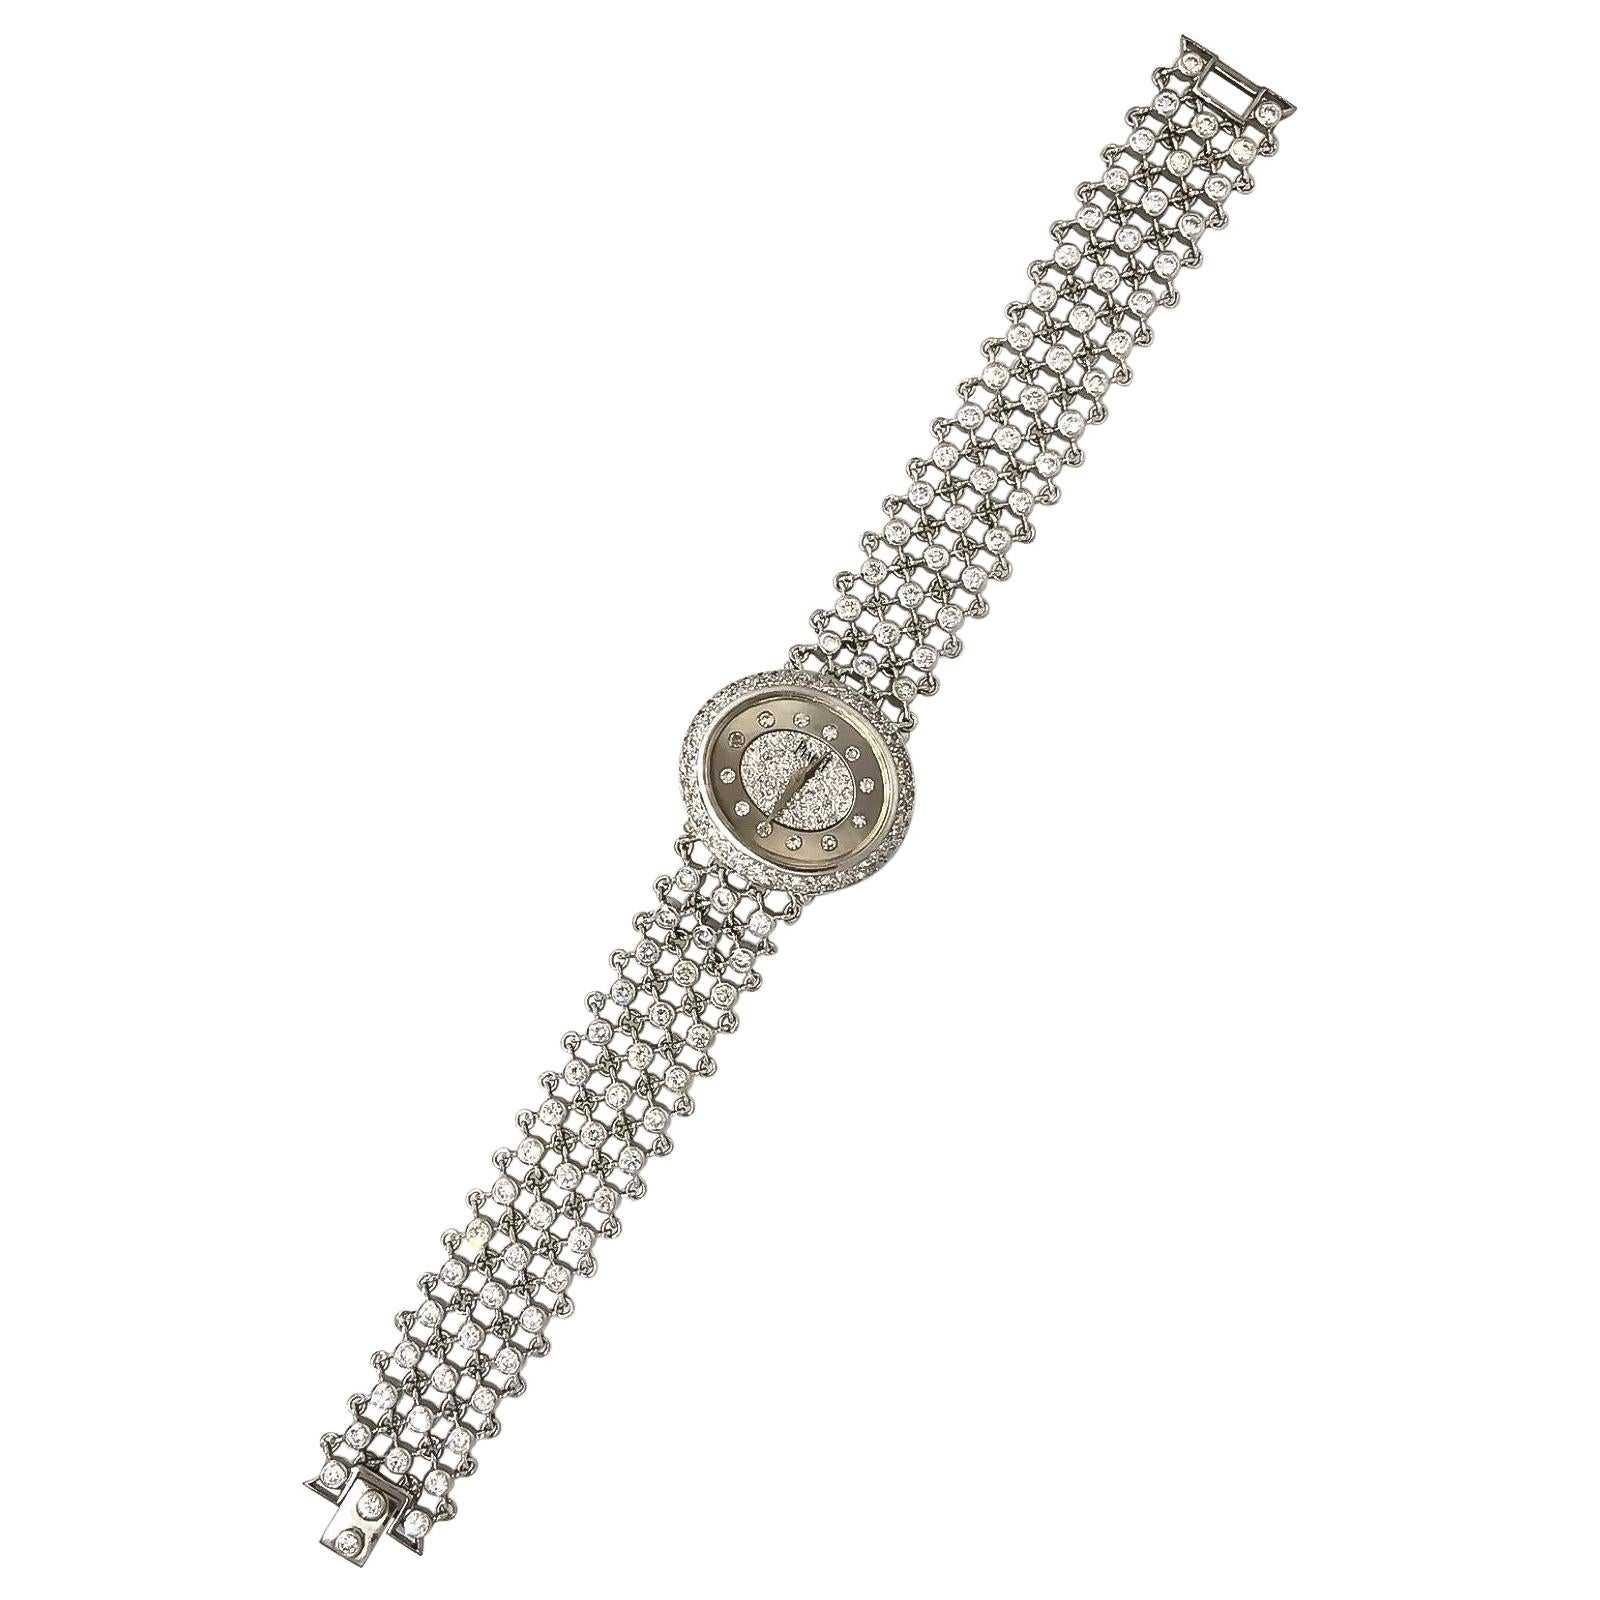 Piaget 1960s Diamond Set 18 Karat White Gold Bracelet Wristwatch